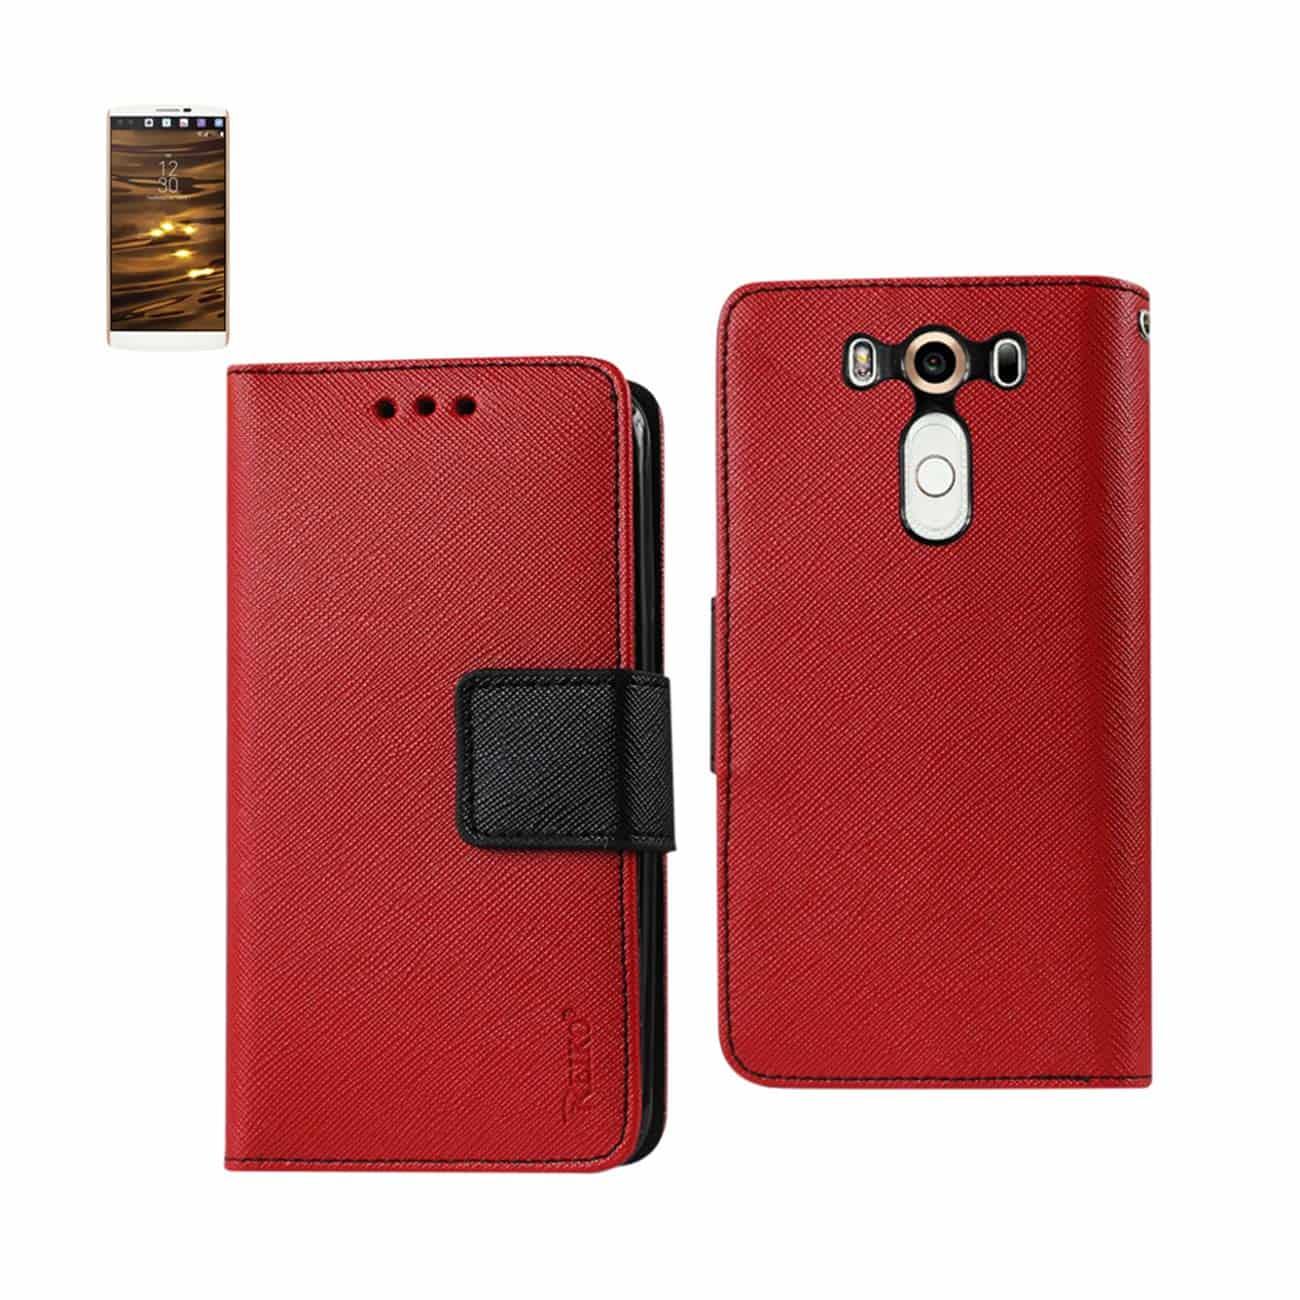 LG V10 3-IN-1 WALLET CASE IN RED